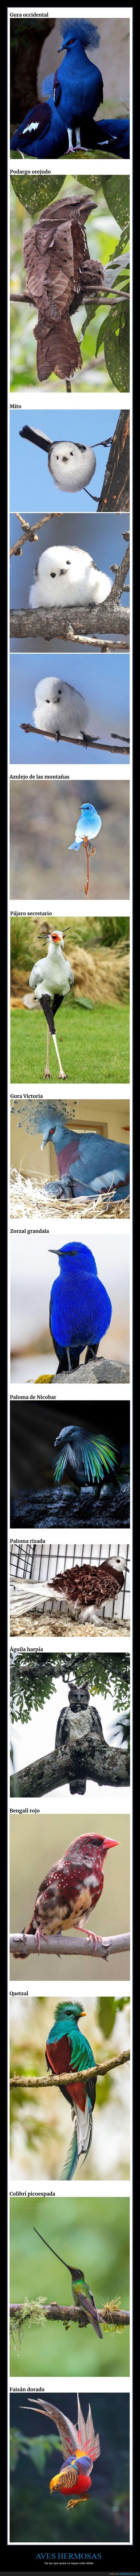 aves,curiosidades,pájaros